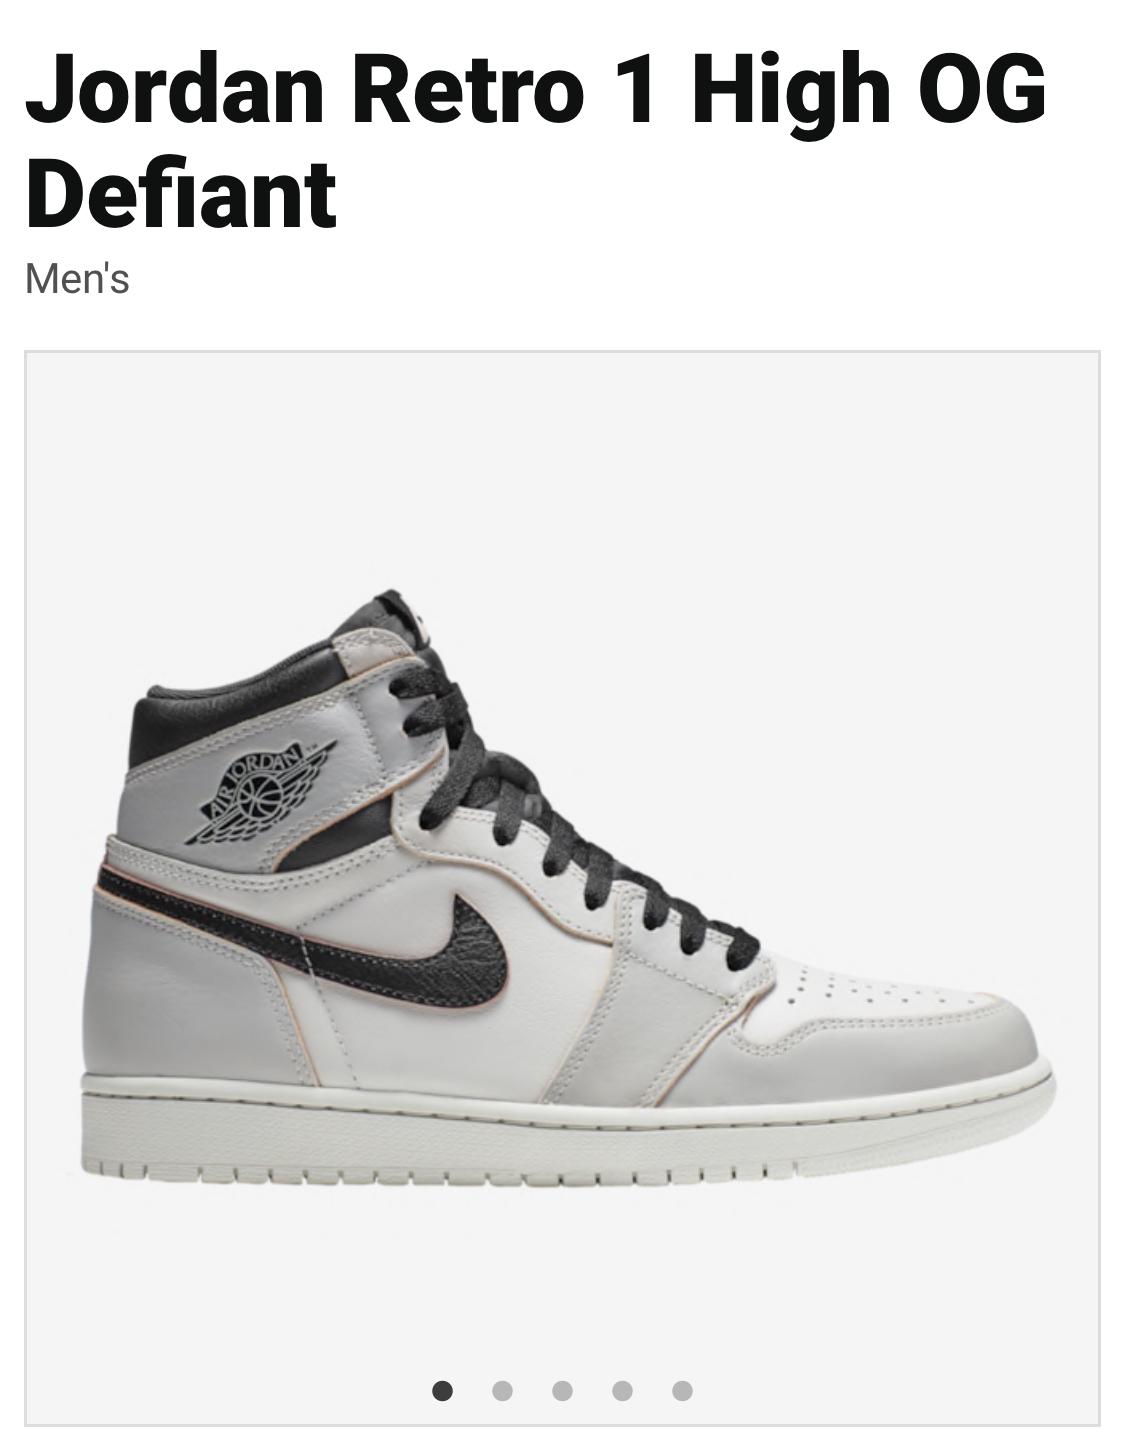 Nike Air Jordan Retro 1 High OG Defiant